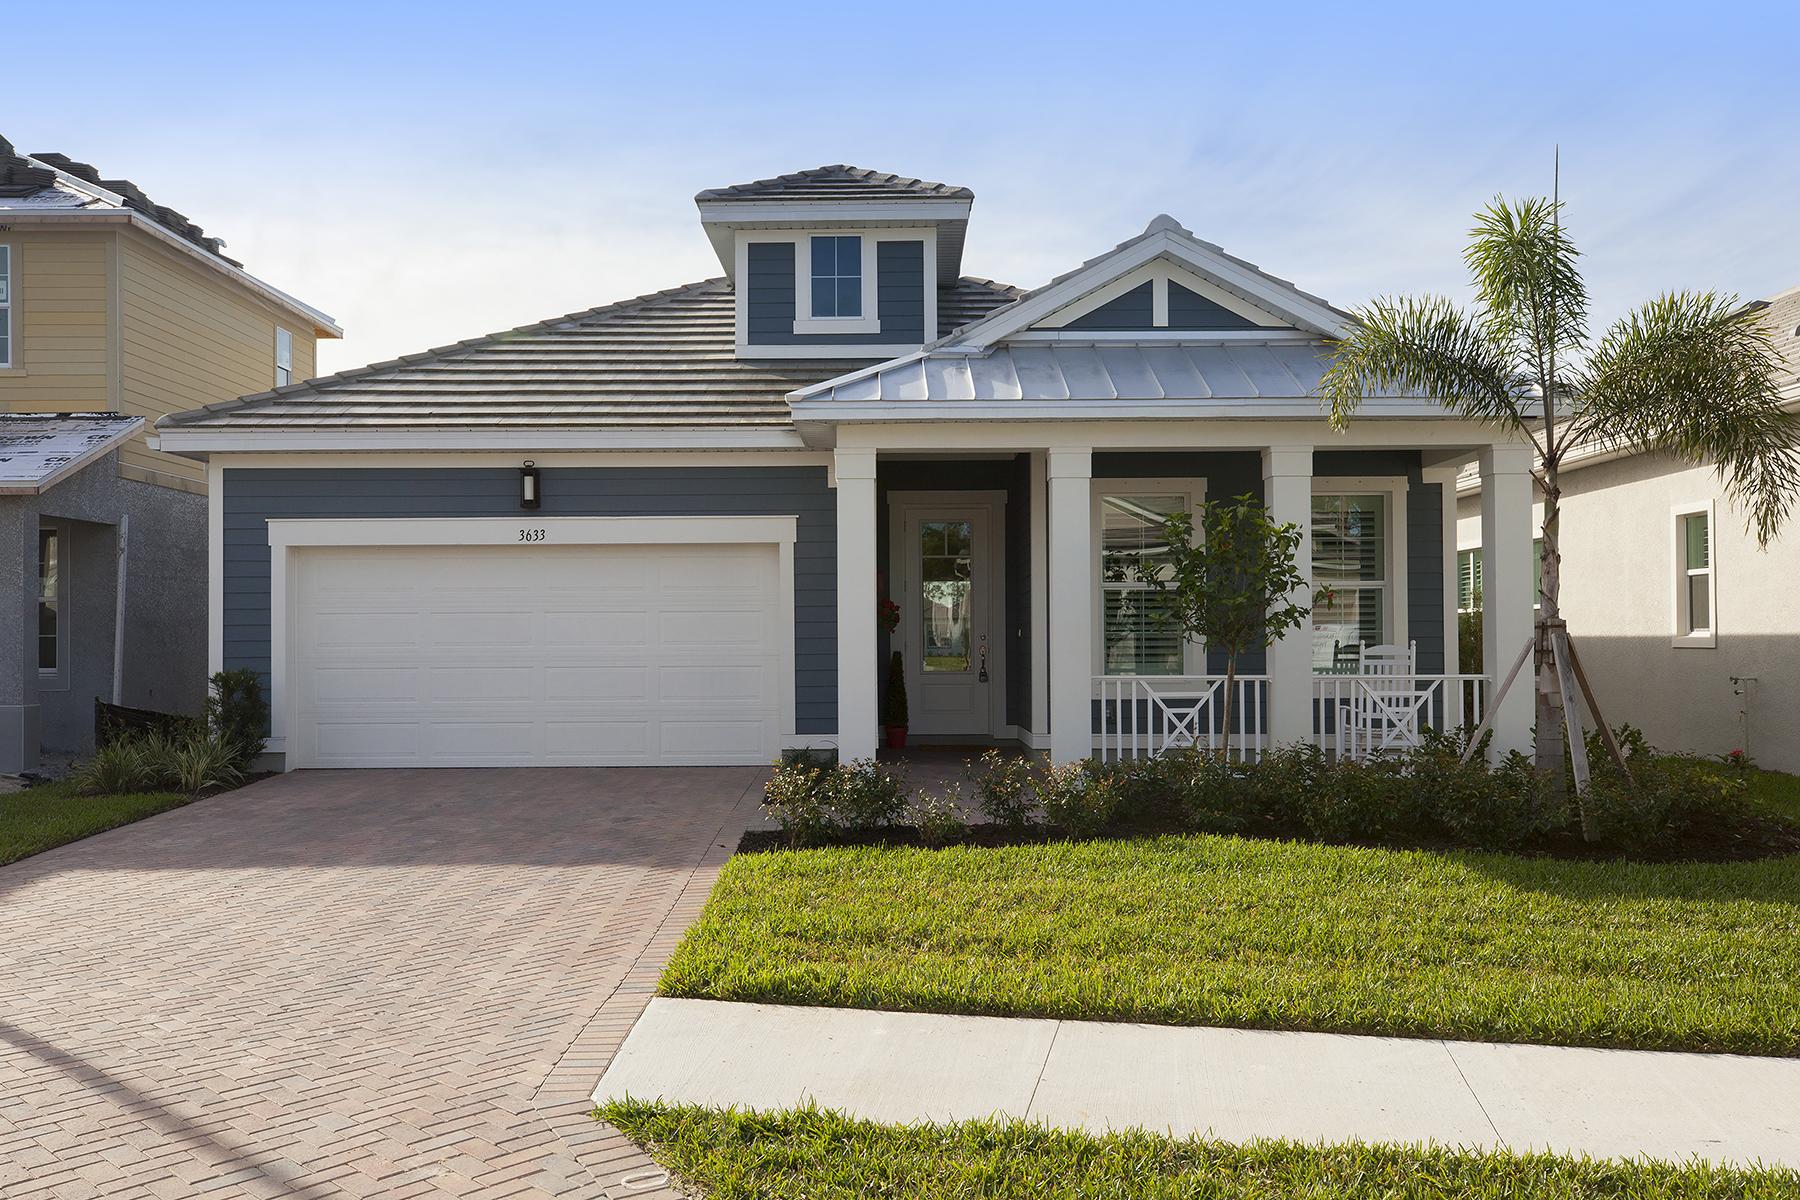 Villa per Vendita alle ore Naples - Warm Springs 3633 Pilot Cir, Old Naples, Naples, Florida, 34120 Stati Uniti